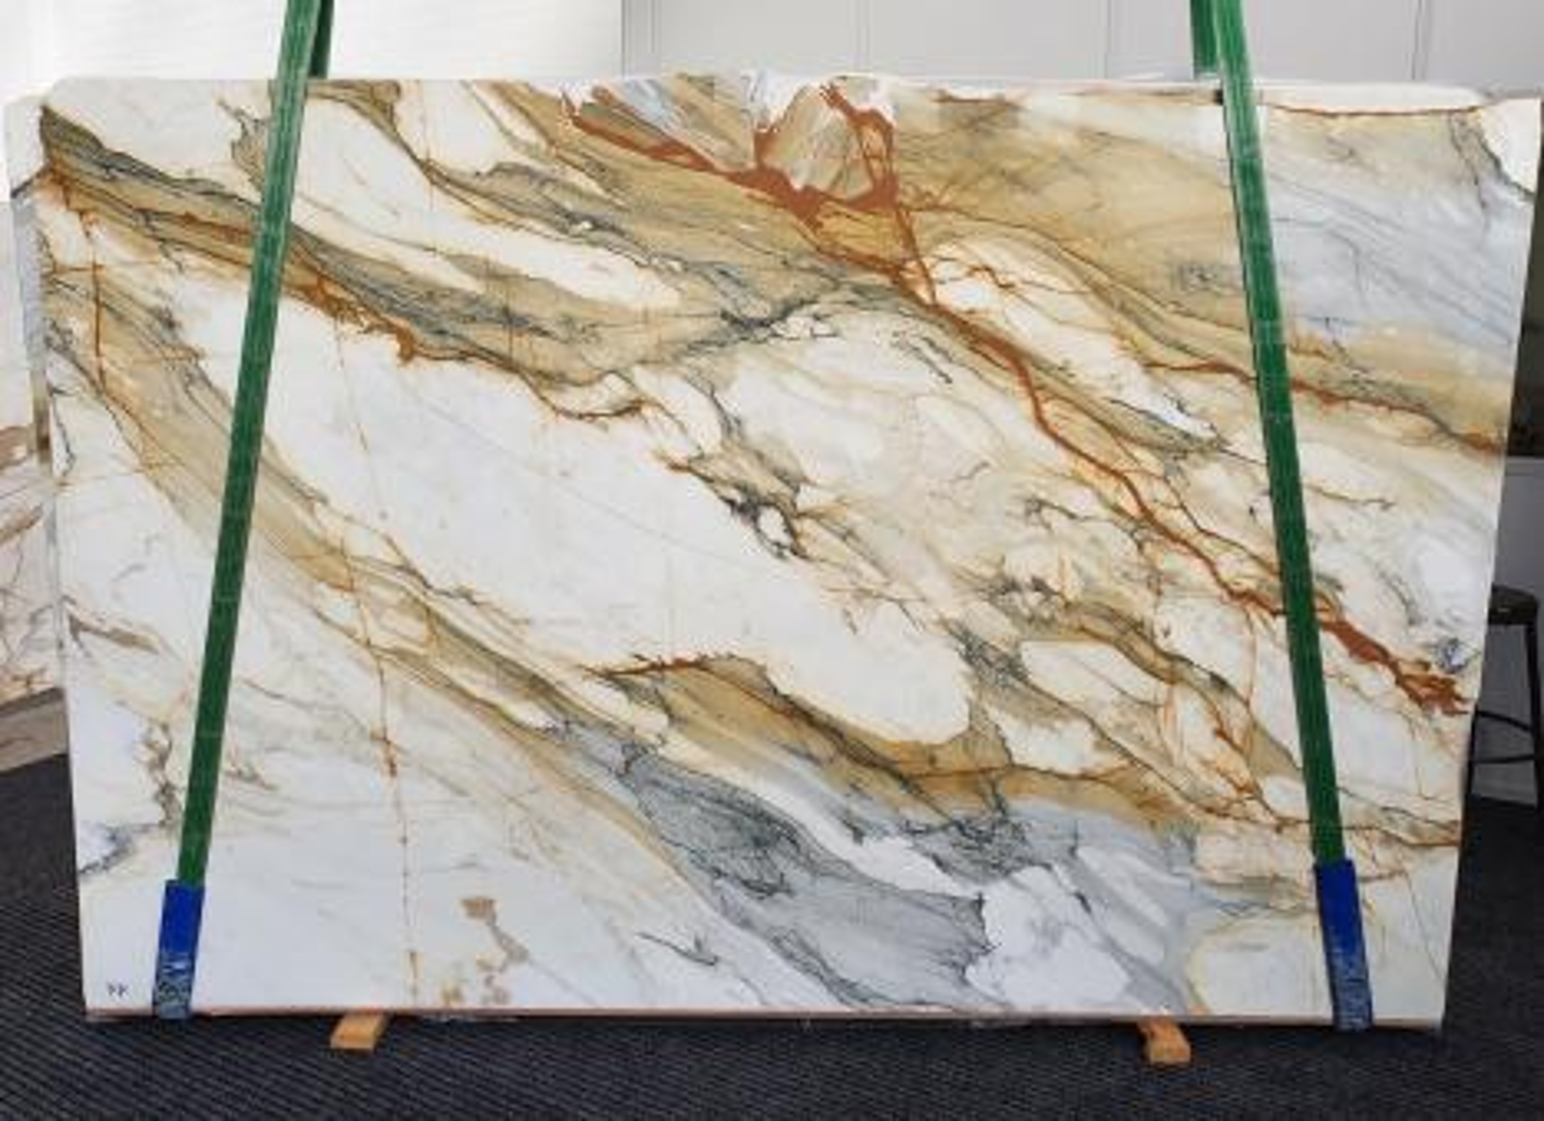 CALACATTA MACCHIAVECCHIA Supply Veneto (Italy) polished slabs 1422 , Slab #11 natural marble